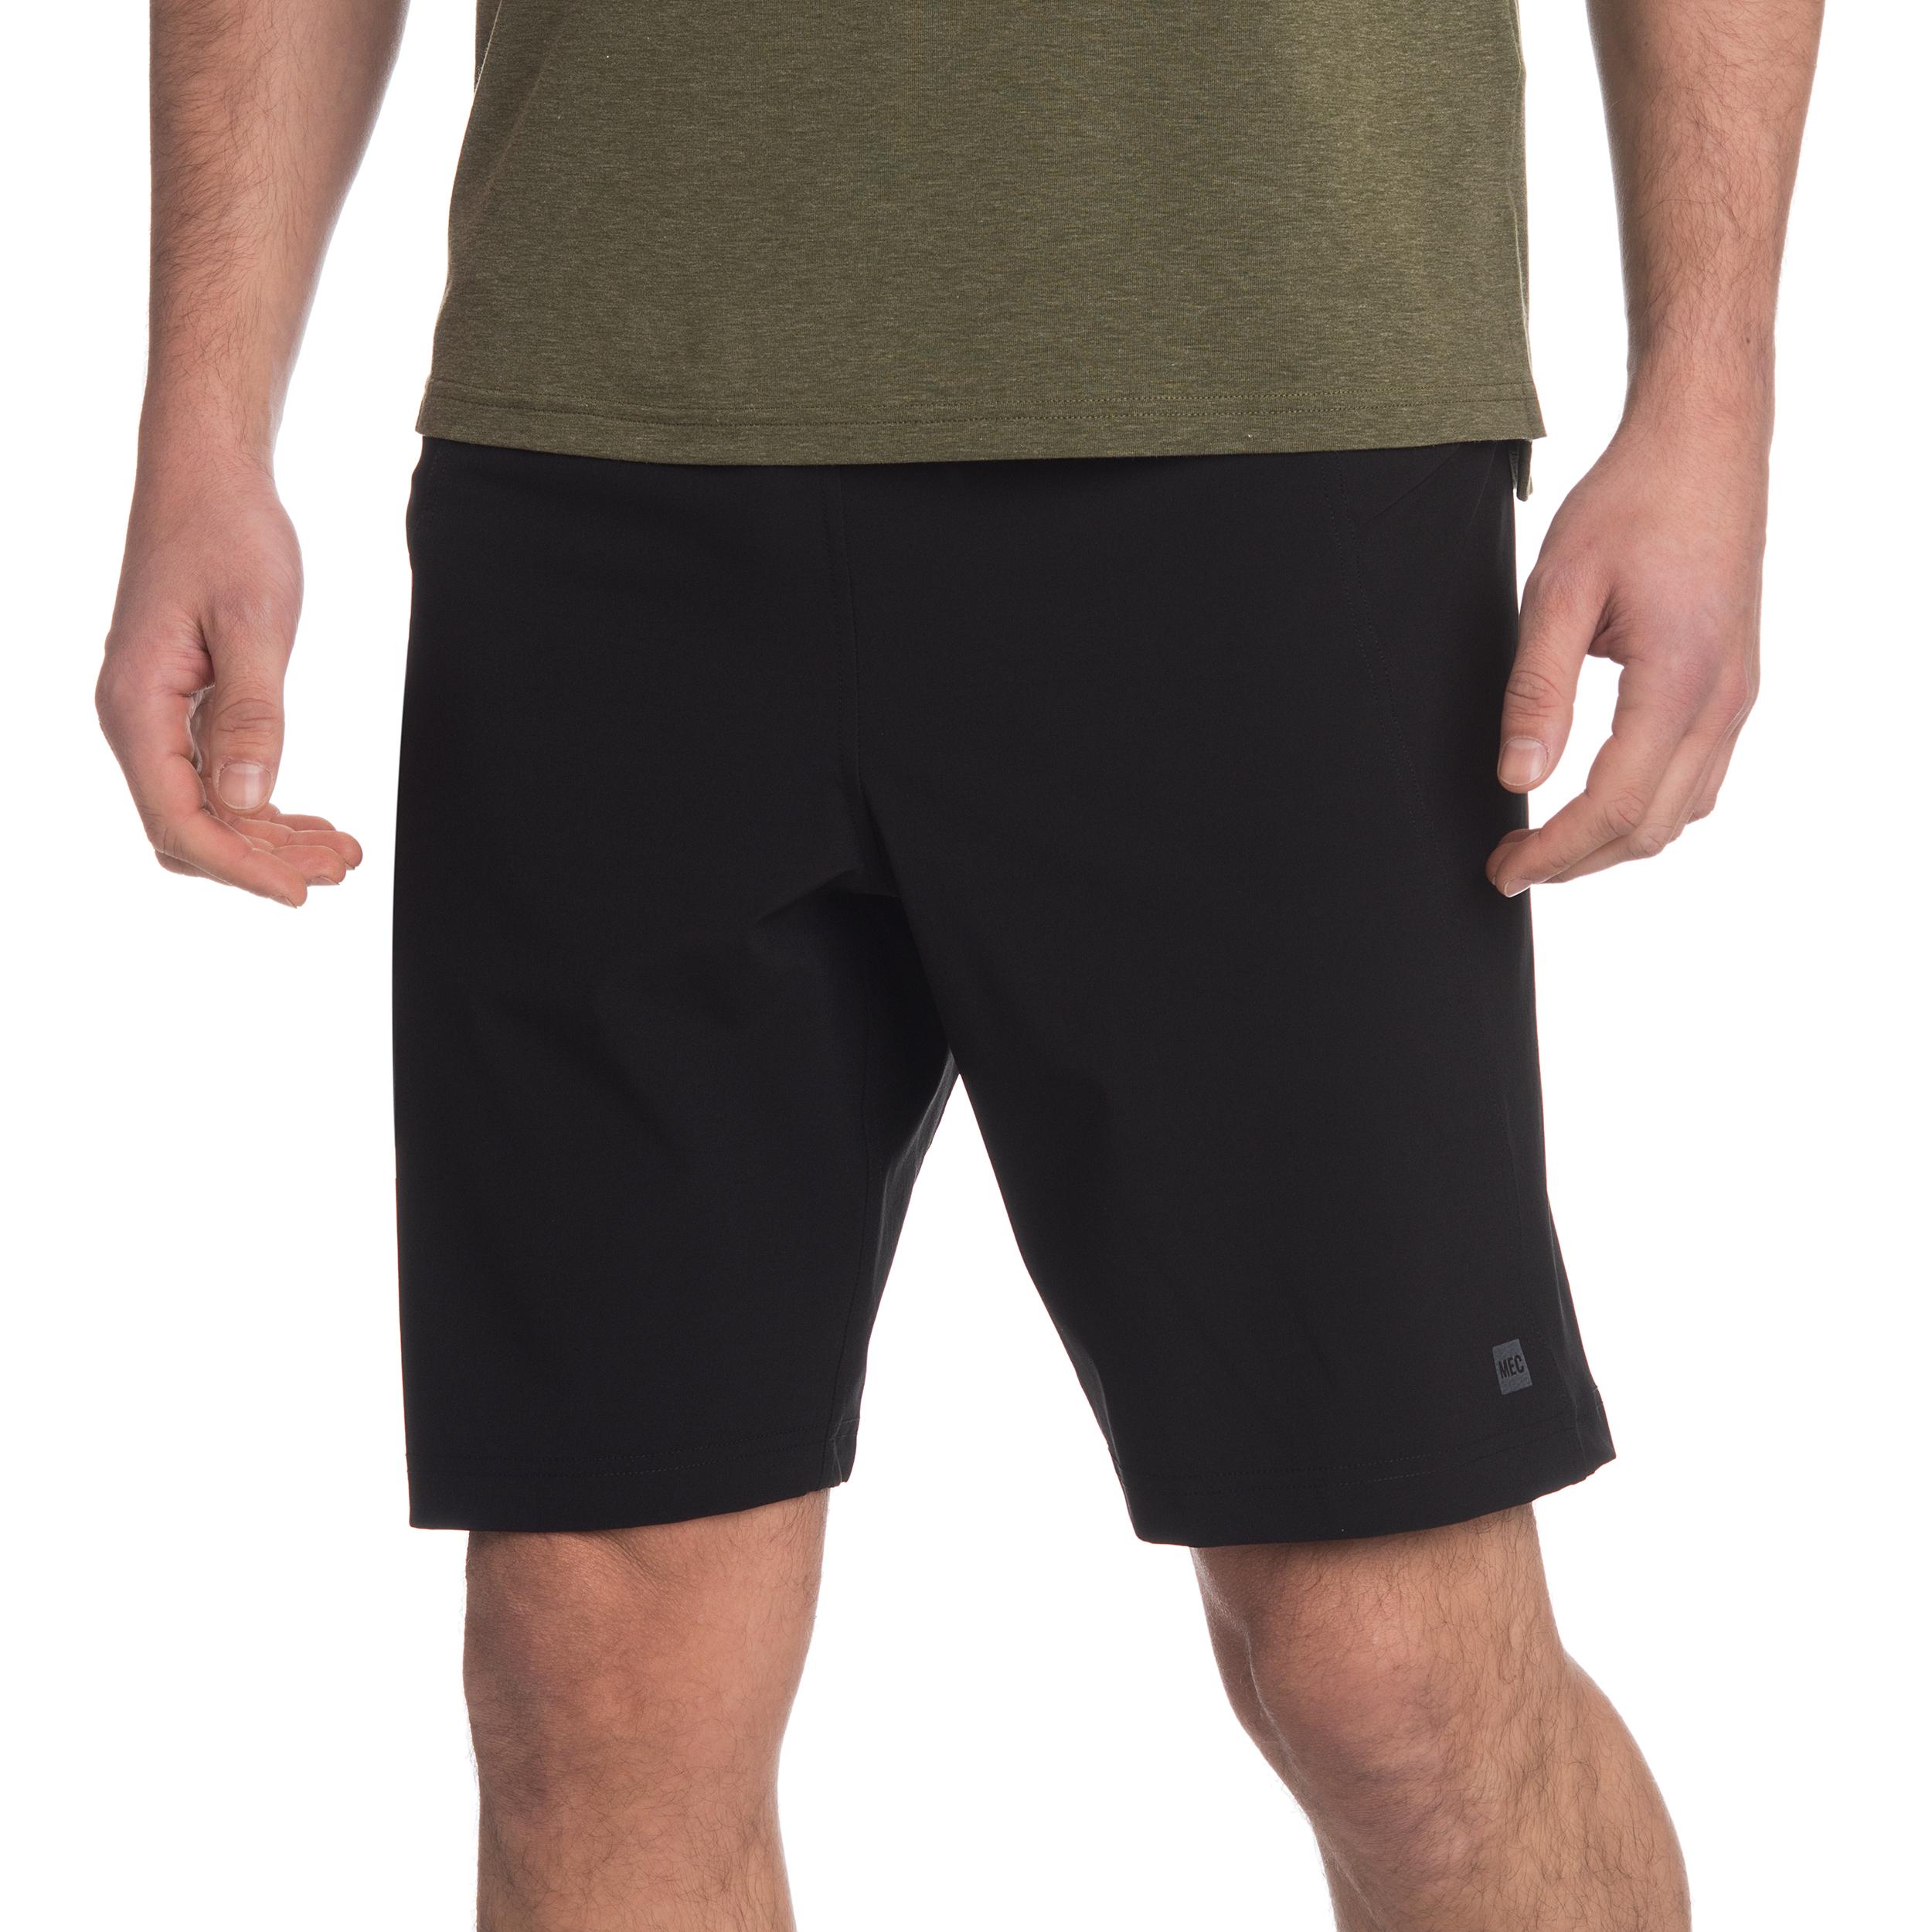 c28ff800f2975 MEC Contour Shorts - Men's